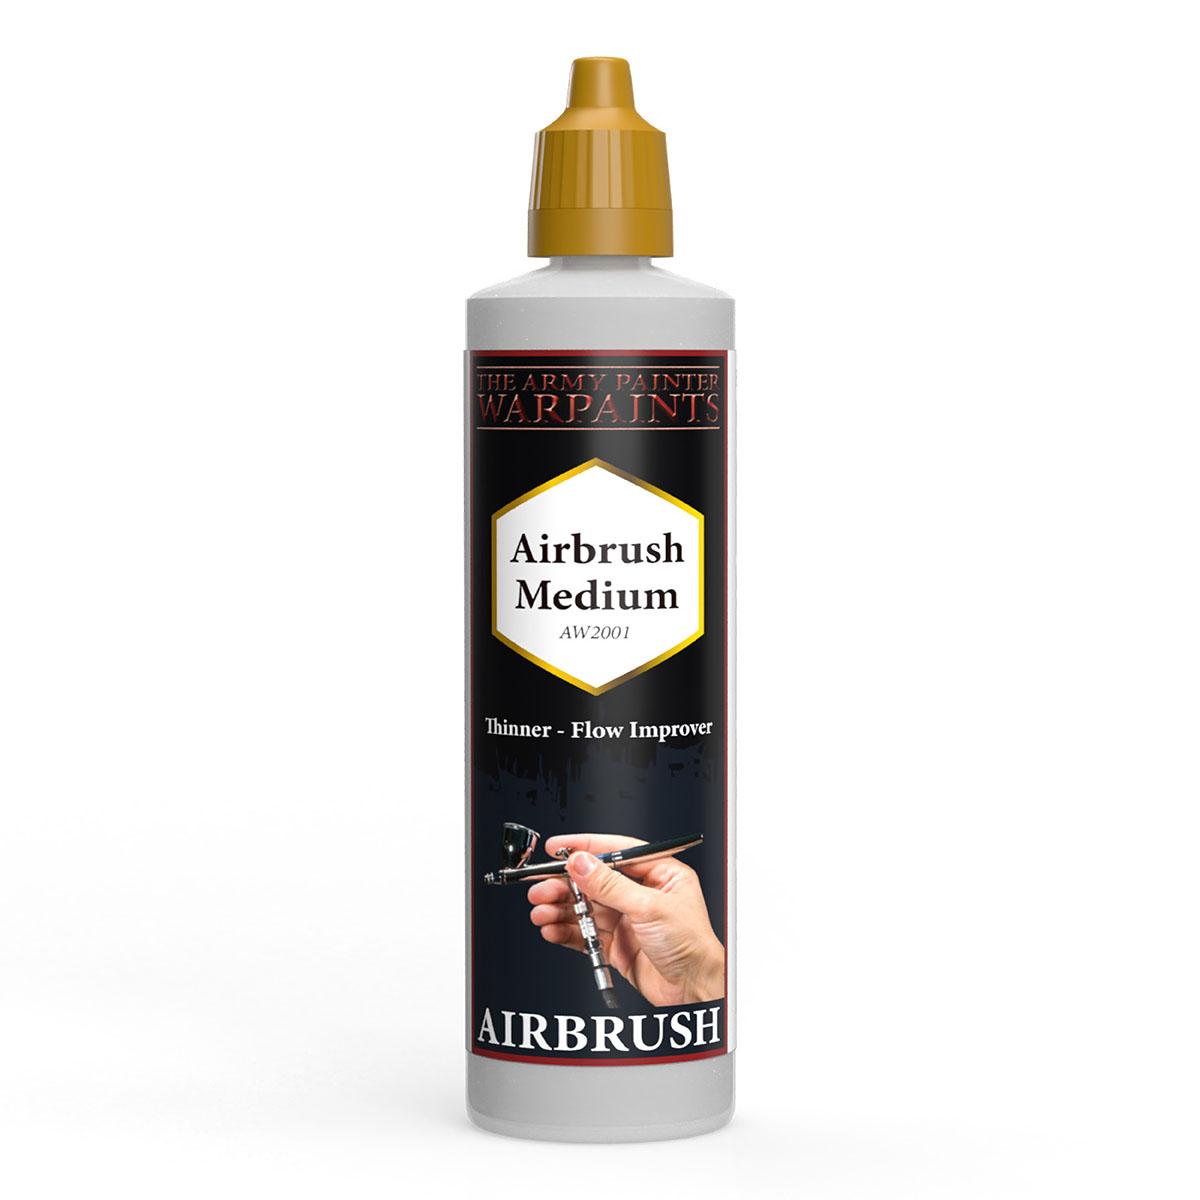 Airbrush Medium